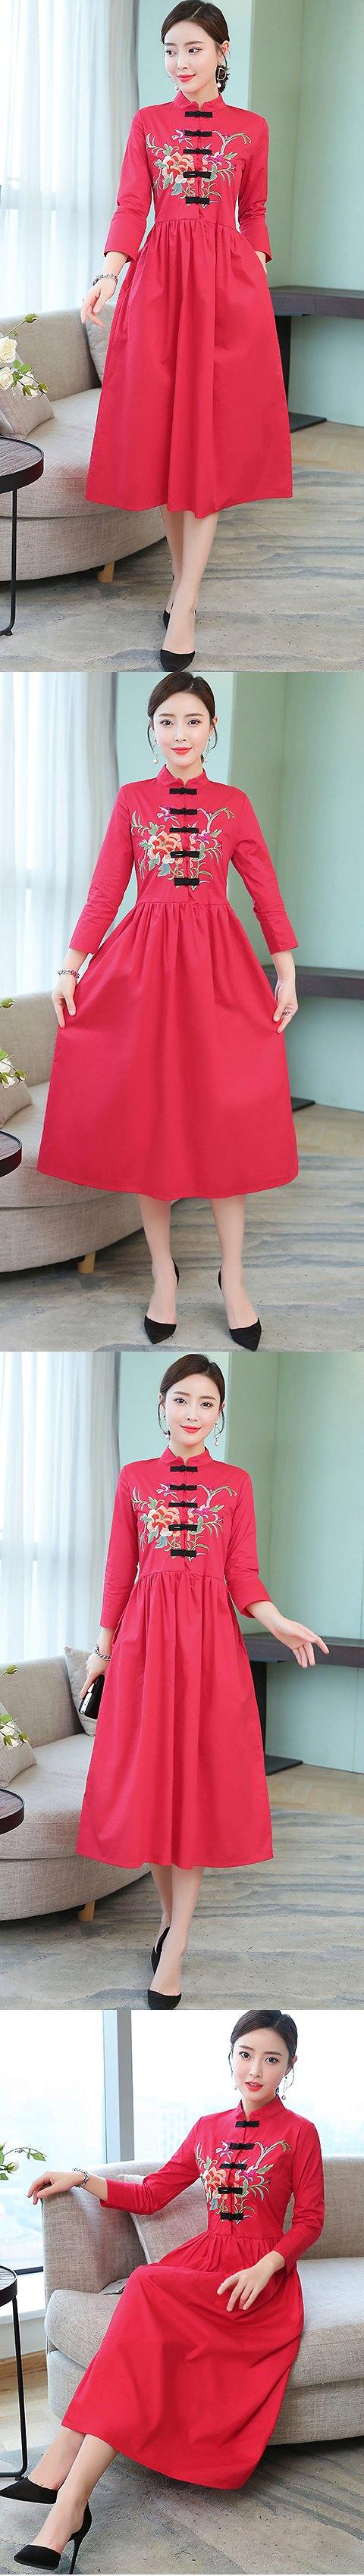 Ethnic Cotton Linen Pleated Cheongsam Dress (RM)